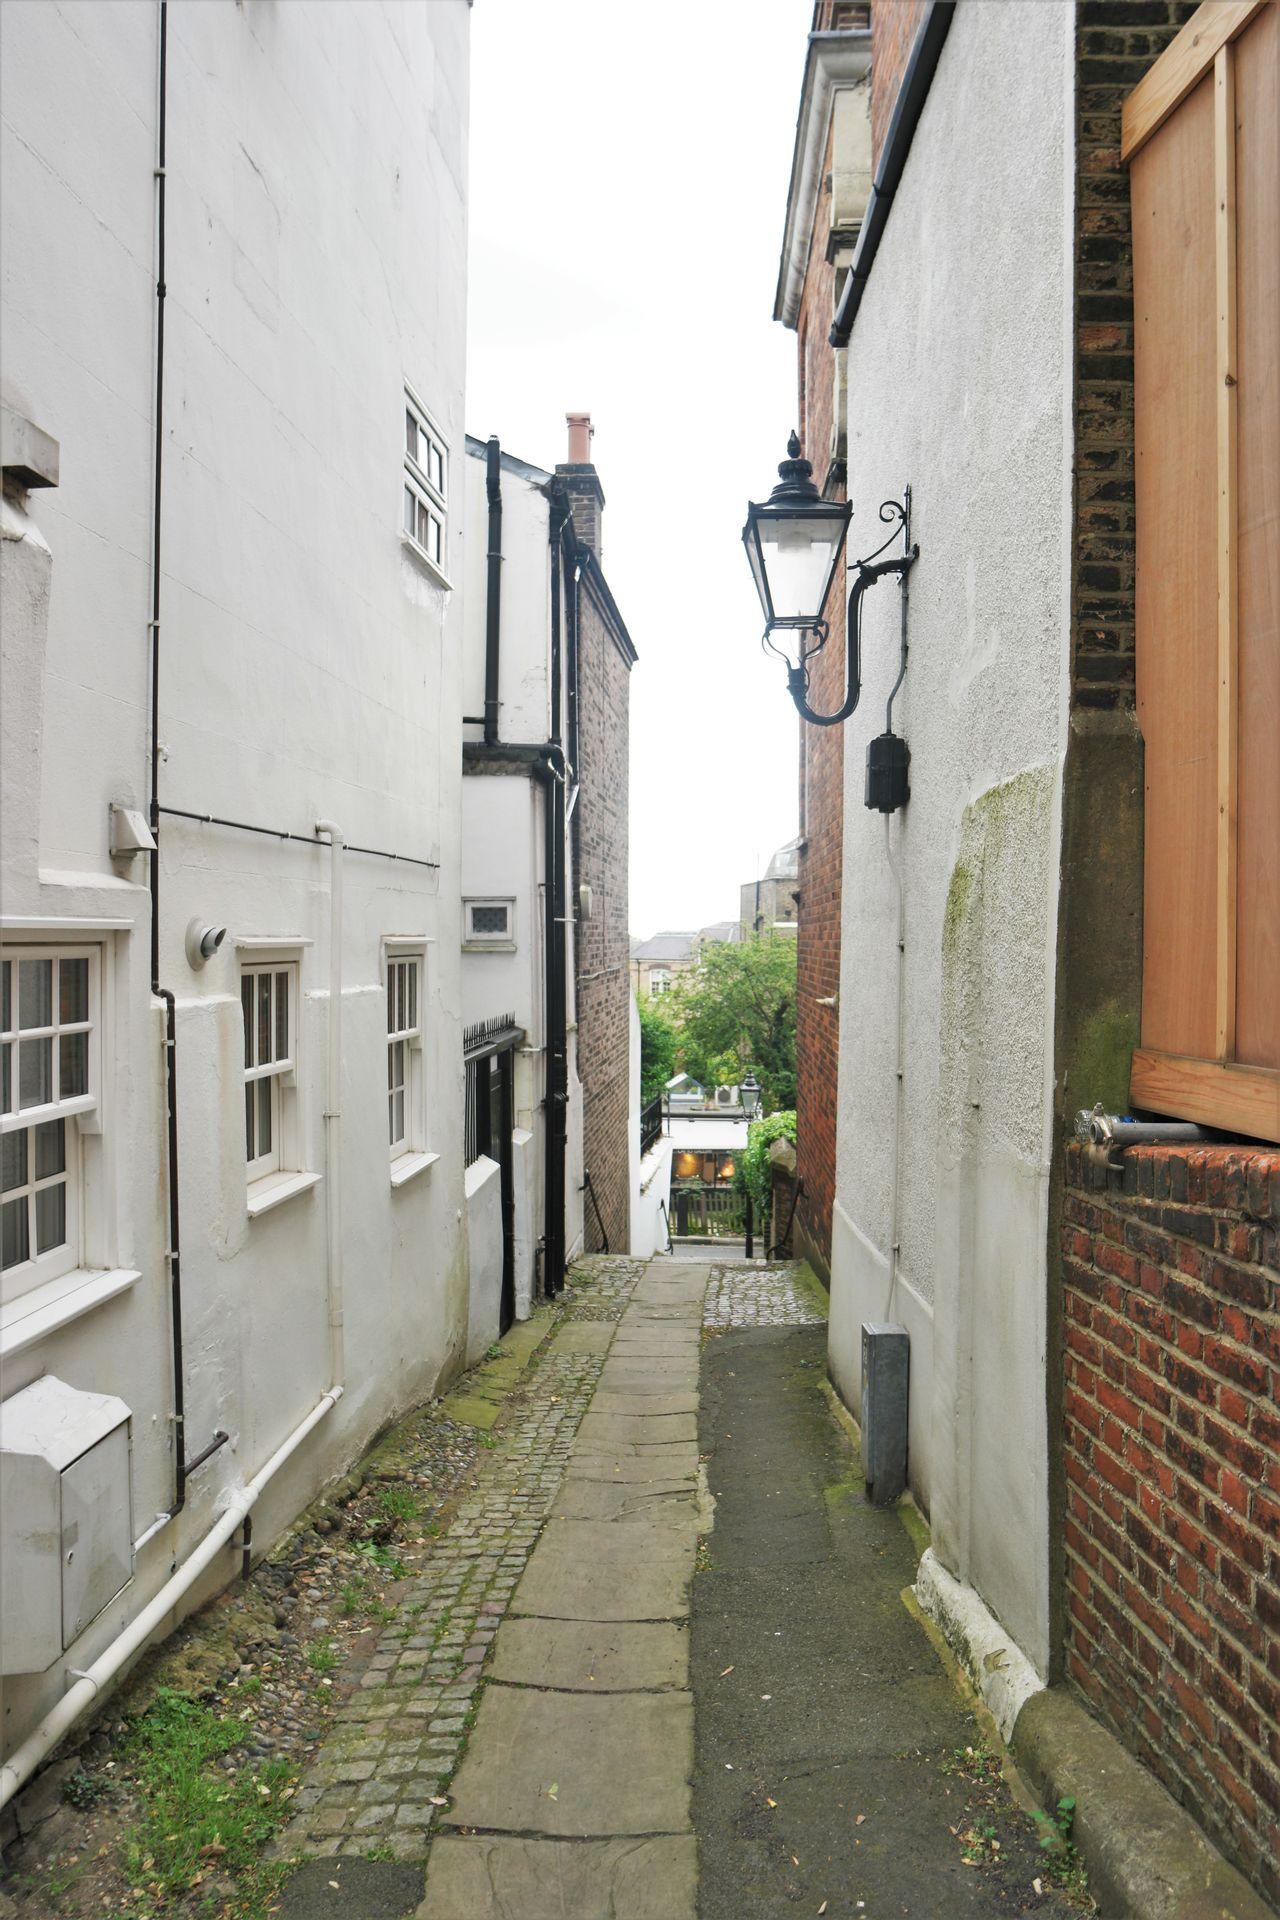 Alley English Hampstead Heath Quaint  Street Traditional